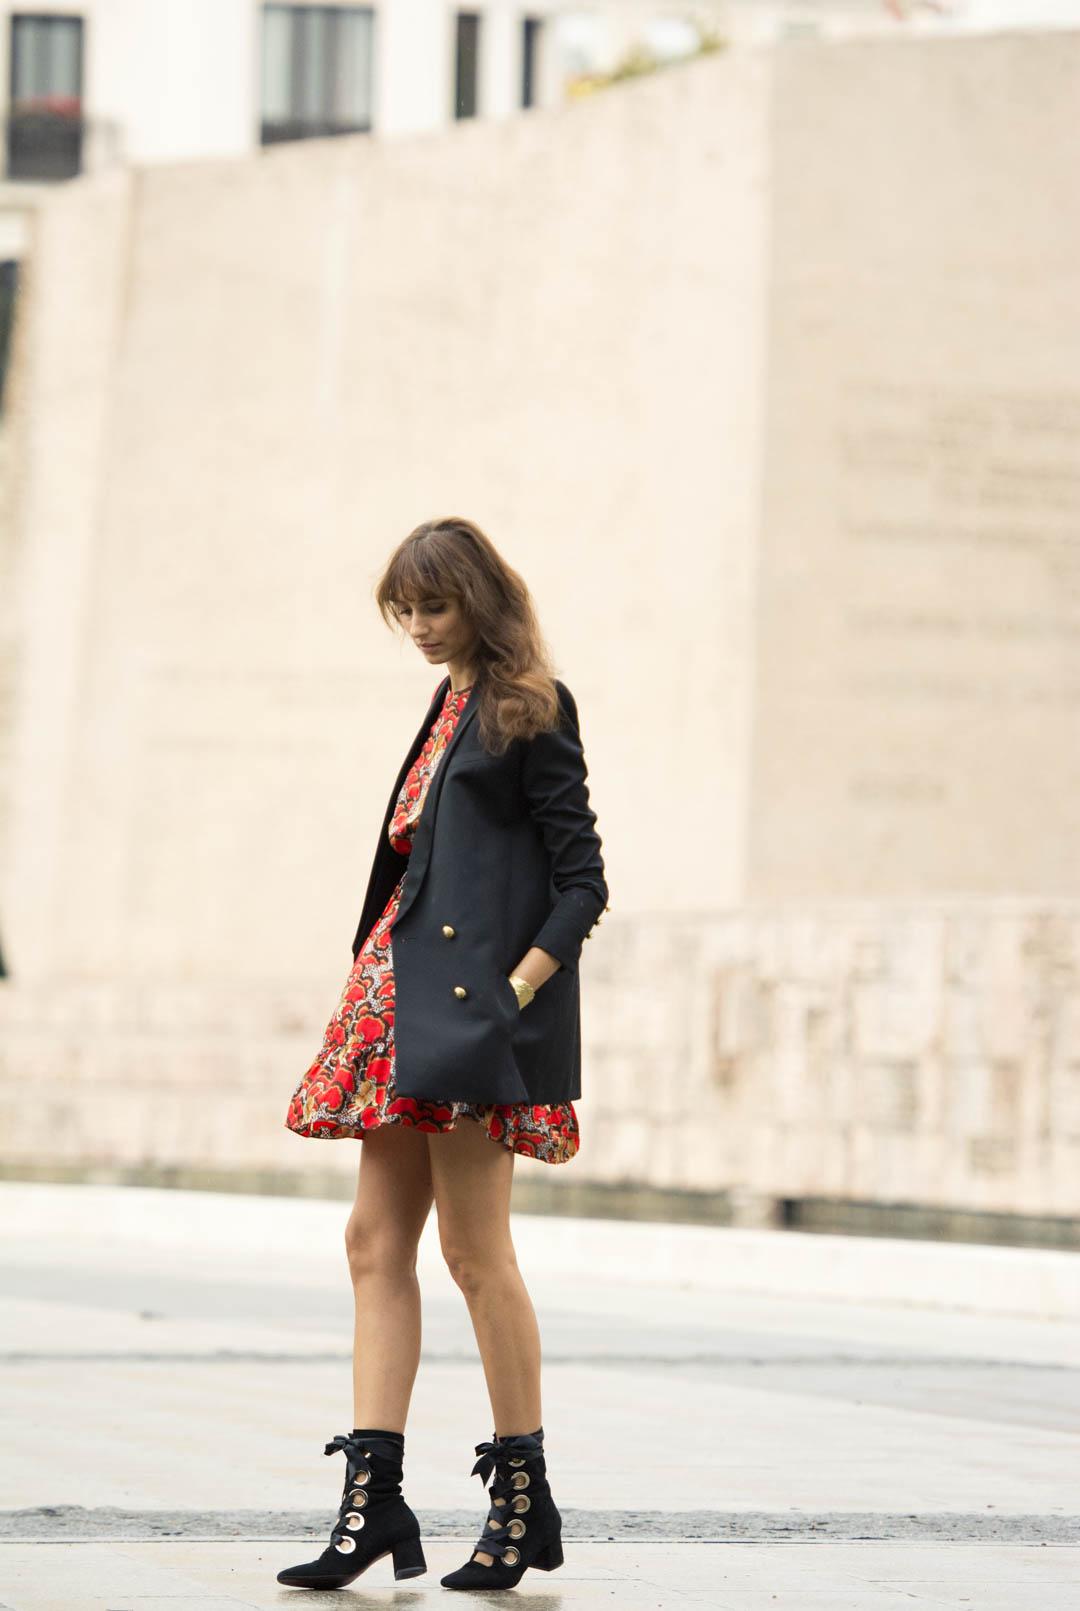 sandro-red-dress-mitmeblog-street-style-mayte-de-la-iglesia-web-04